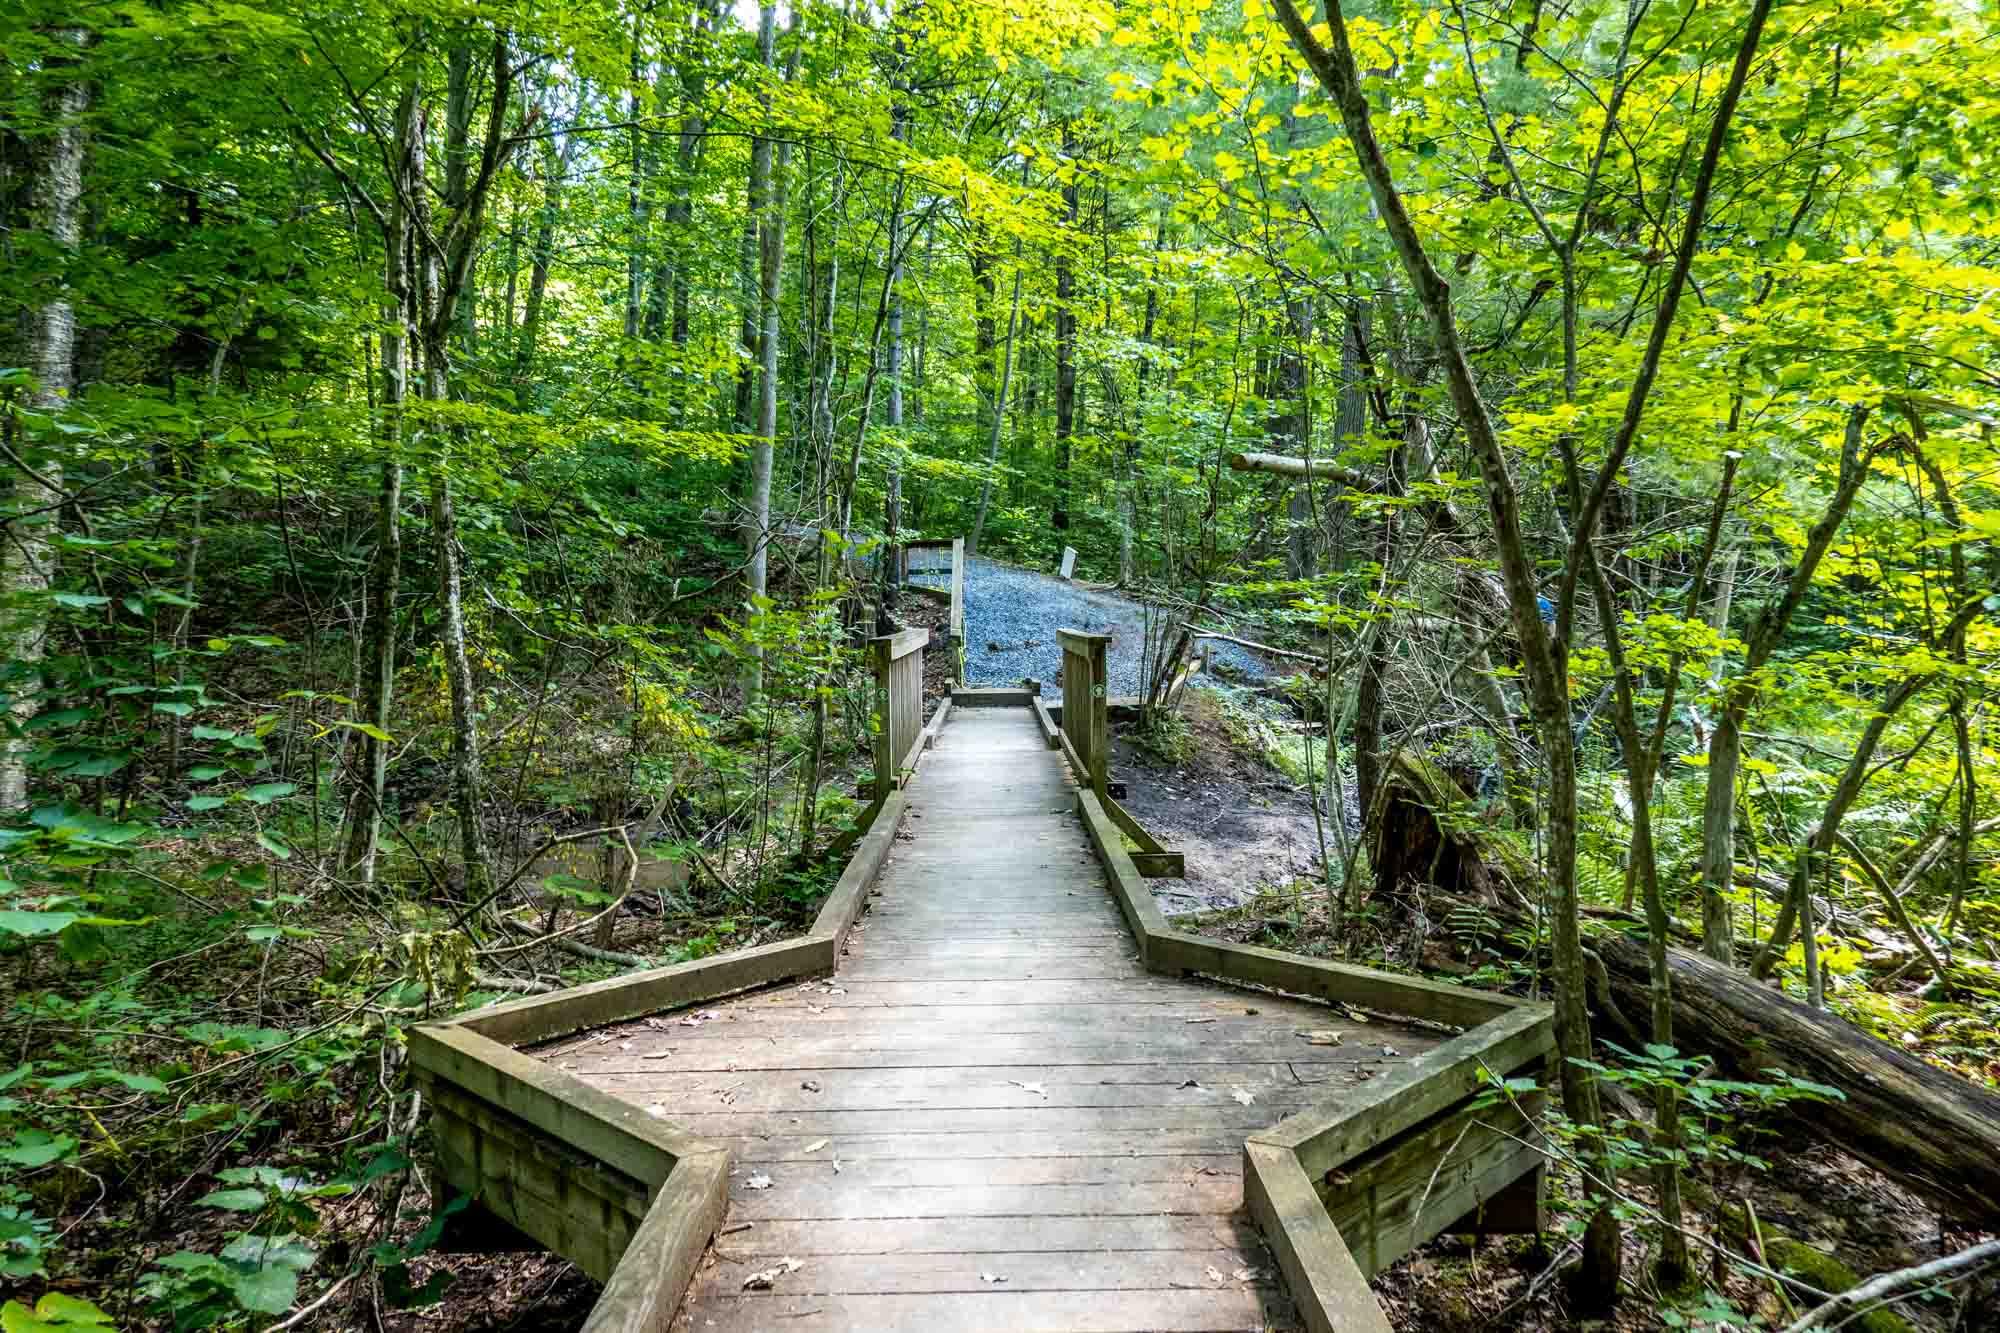 Wooden walkway through lush, green vegetation